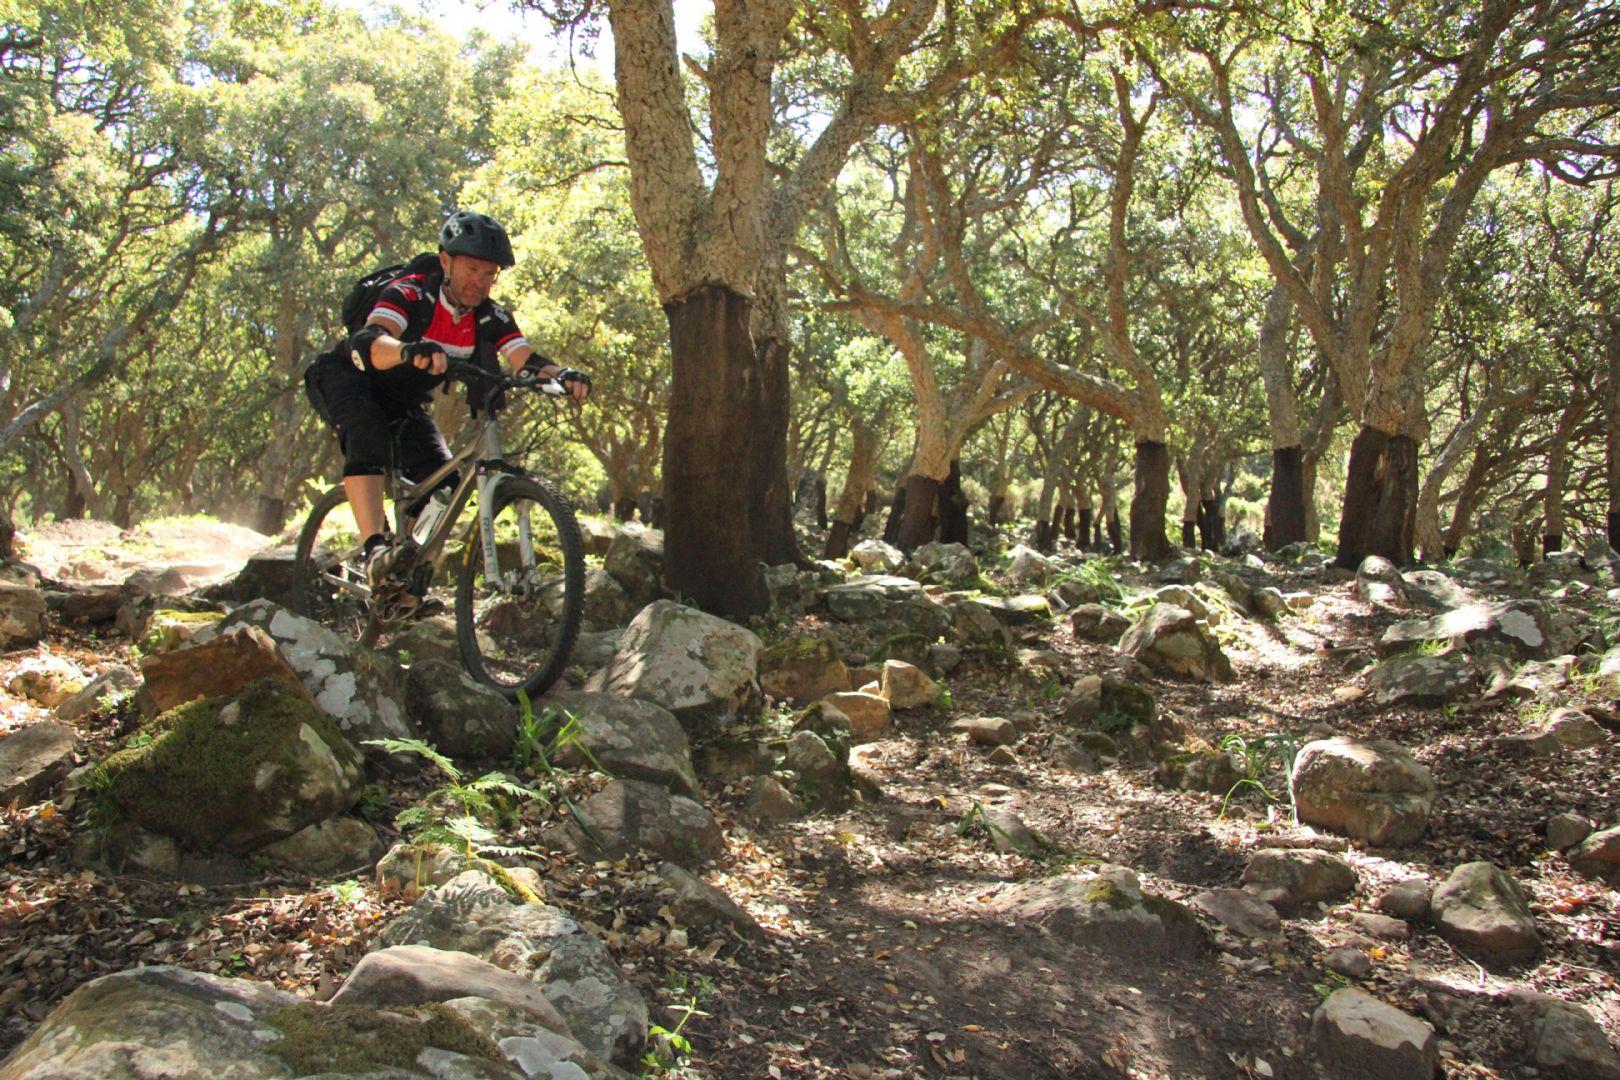 IMG_9498.JPG - Spain - Trans Andaluz - Mountain Biking